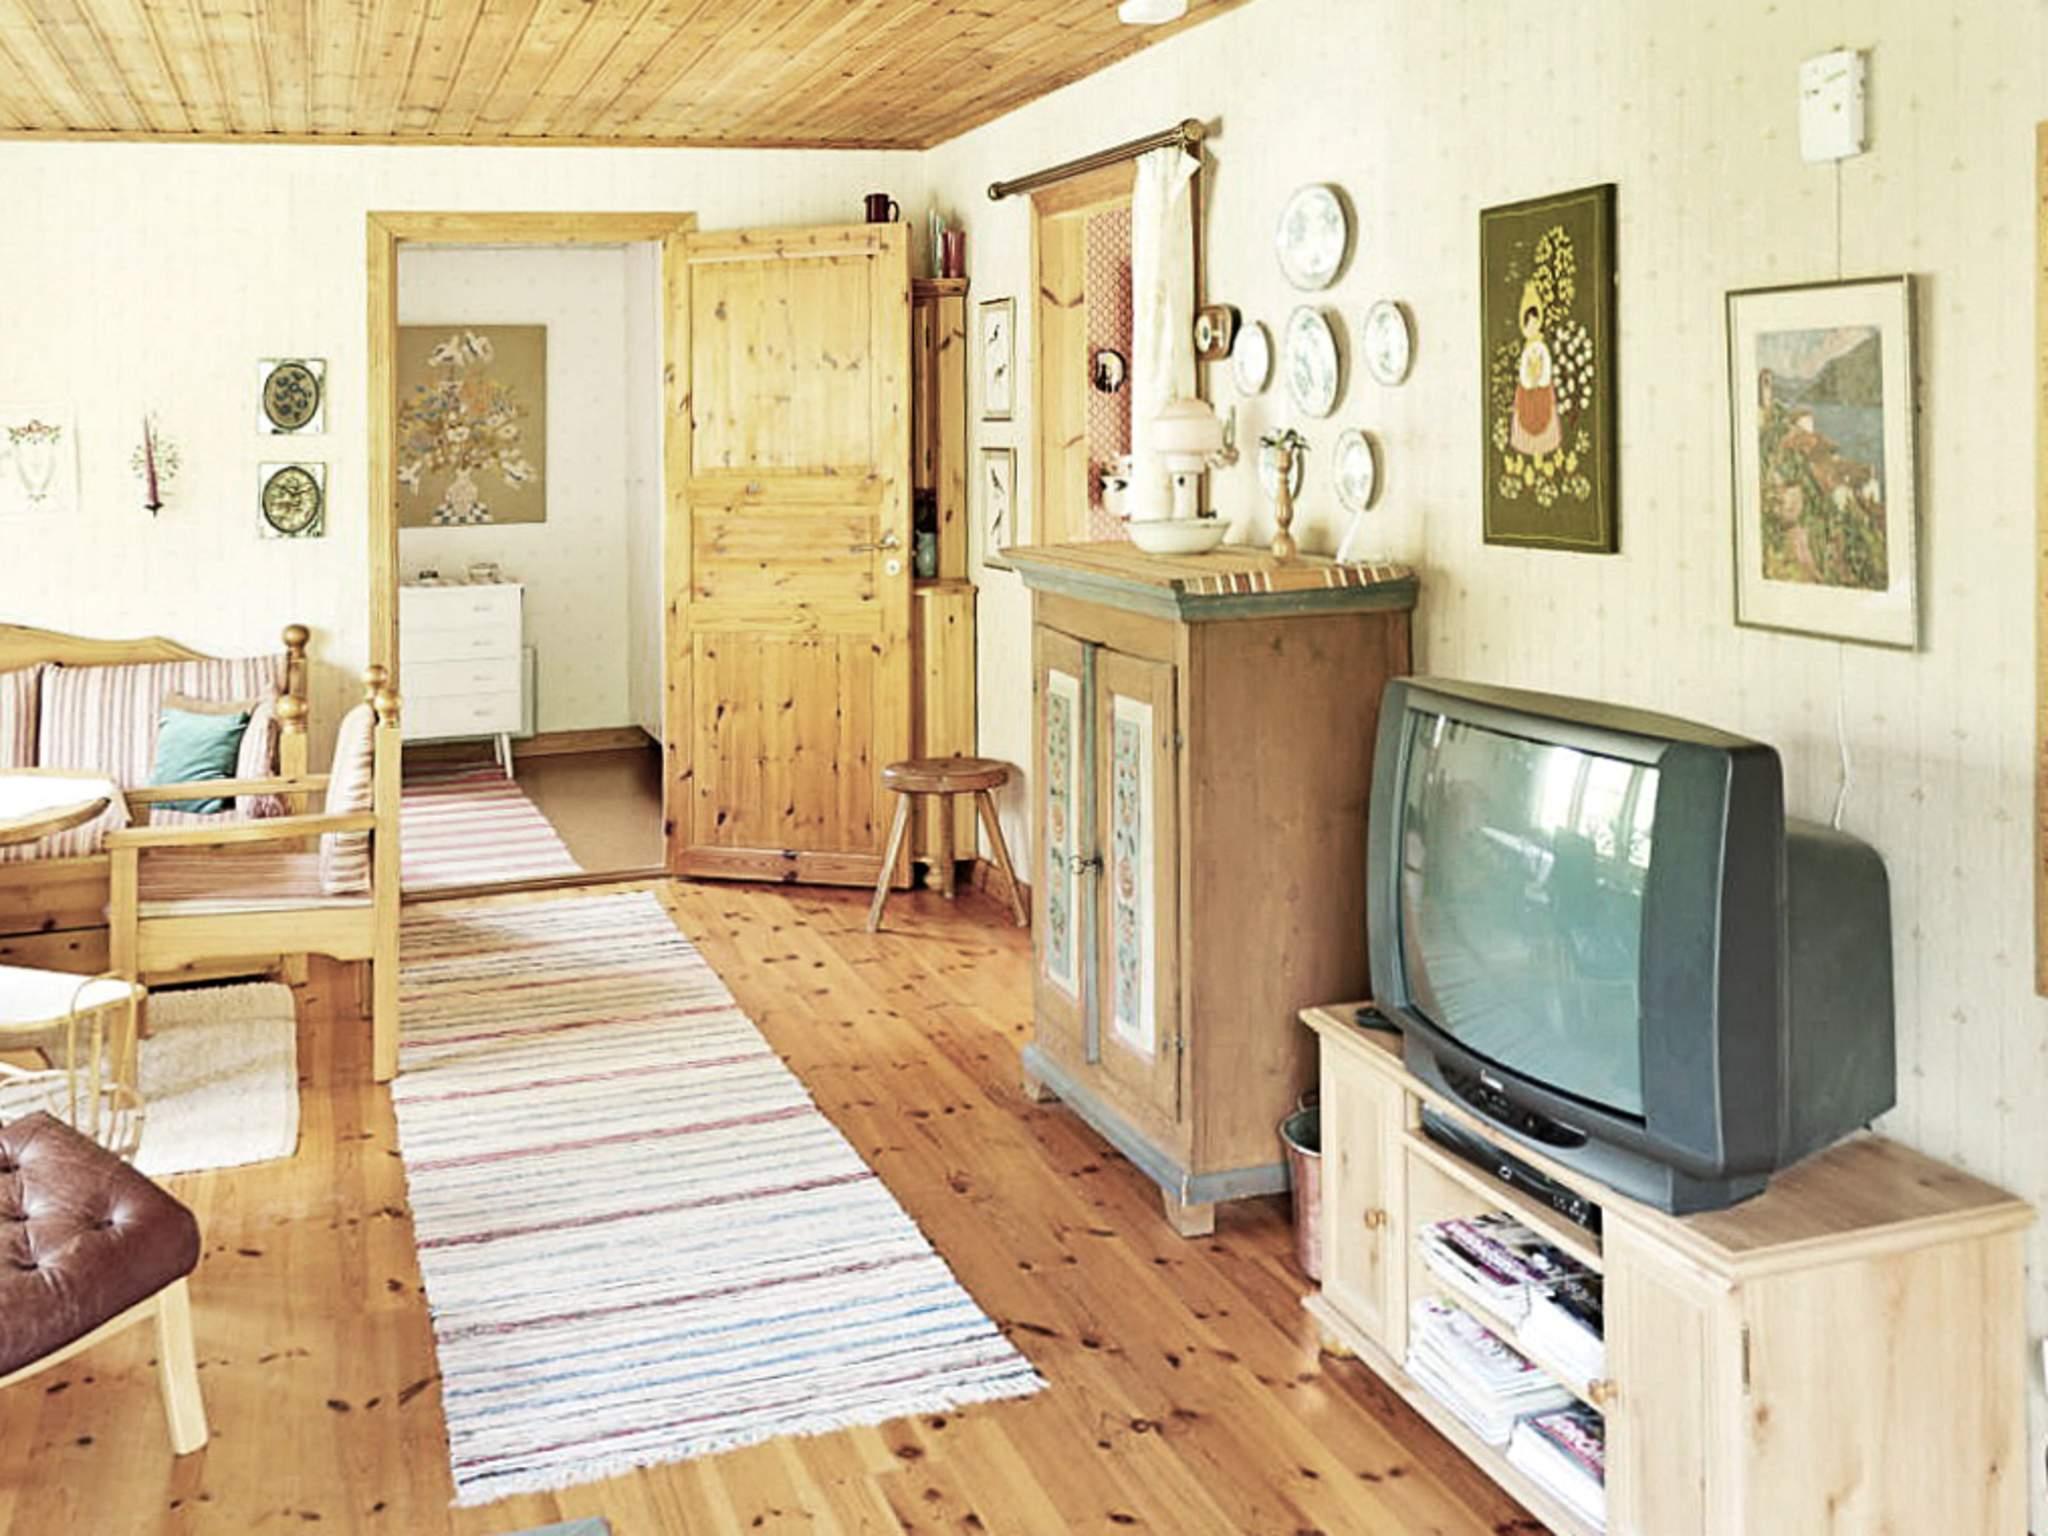 Ferienhaus Motala (921156), Motala, Östergötlands län, Südschweden, Schweden, Bild 4